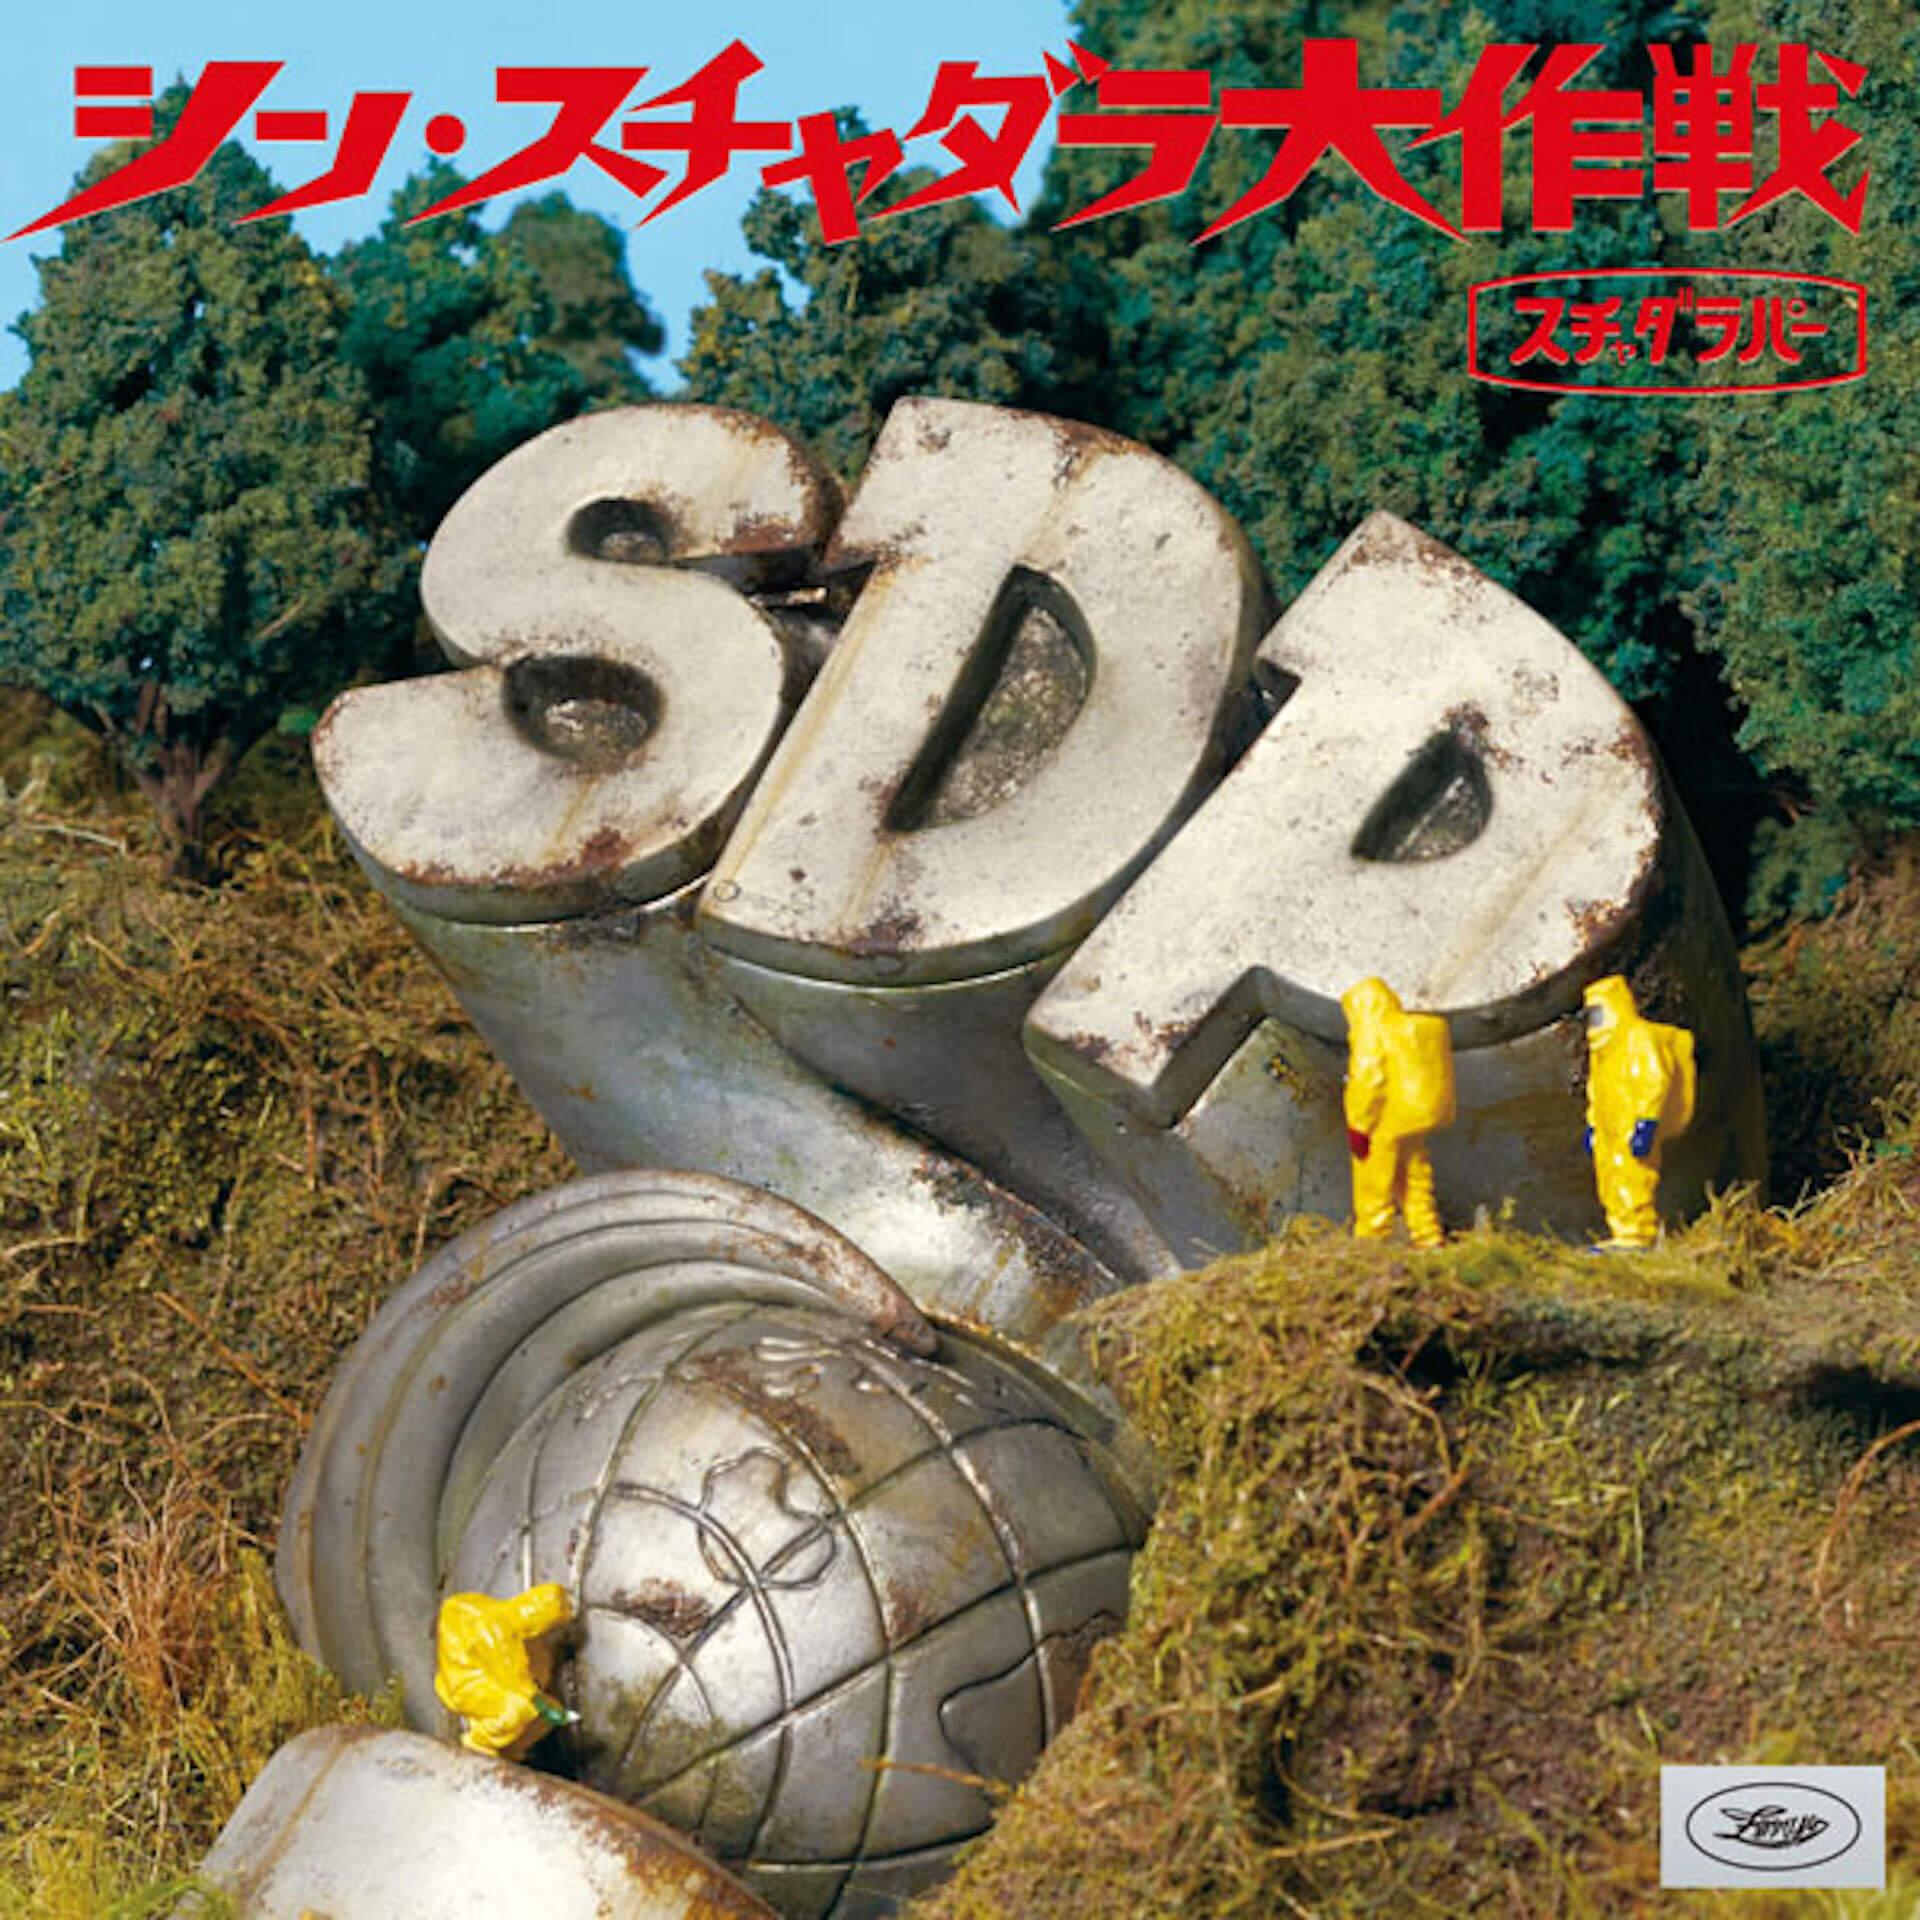 「NO MUSIC,NO LIFE.」ポスターに日本語ラップレジェンドのスチャダラパー×ライムスター、Zeebra×SOUL SCREAMが登場! music200406_nomusicnolife_05